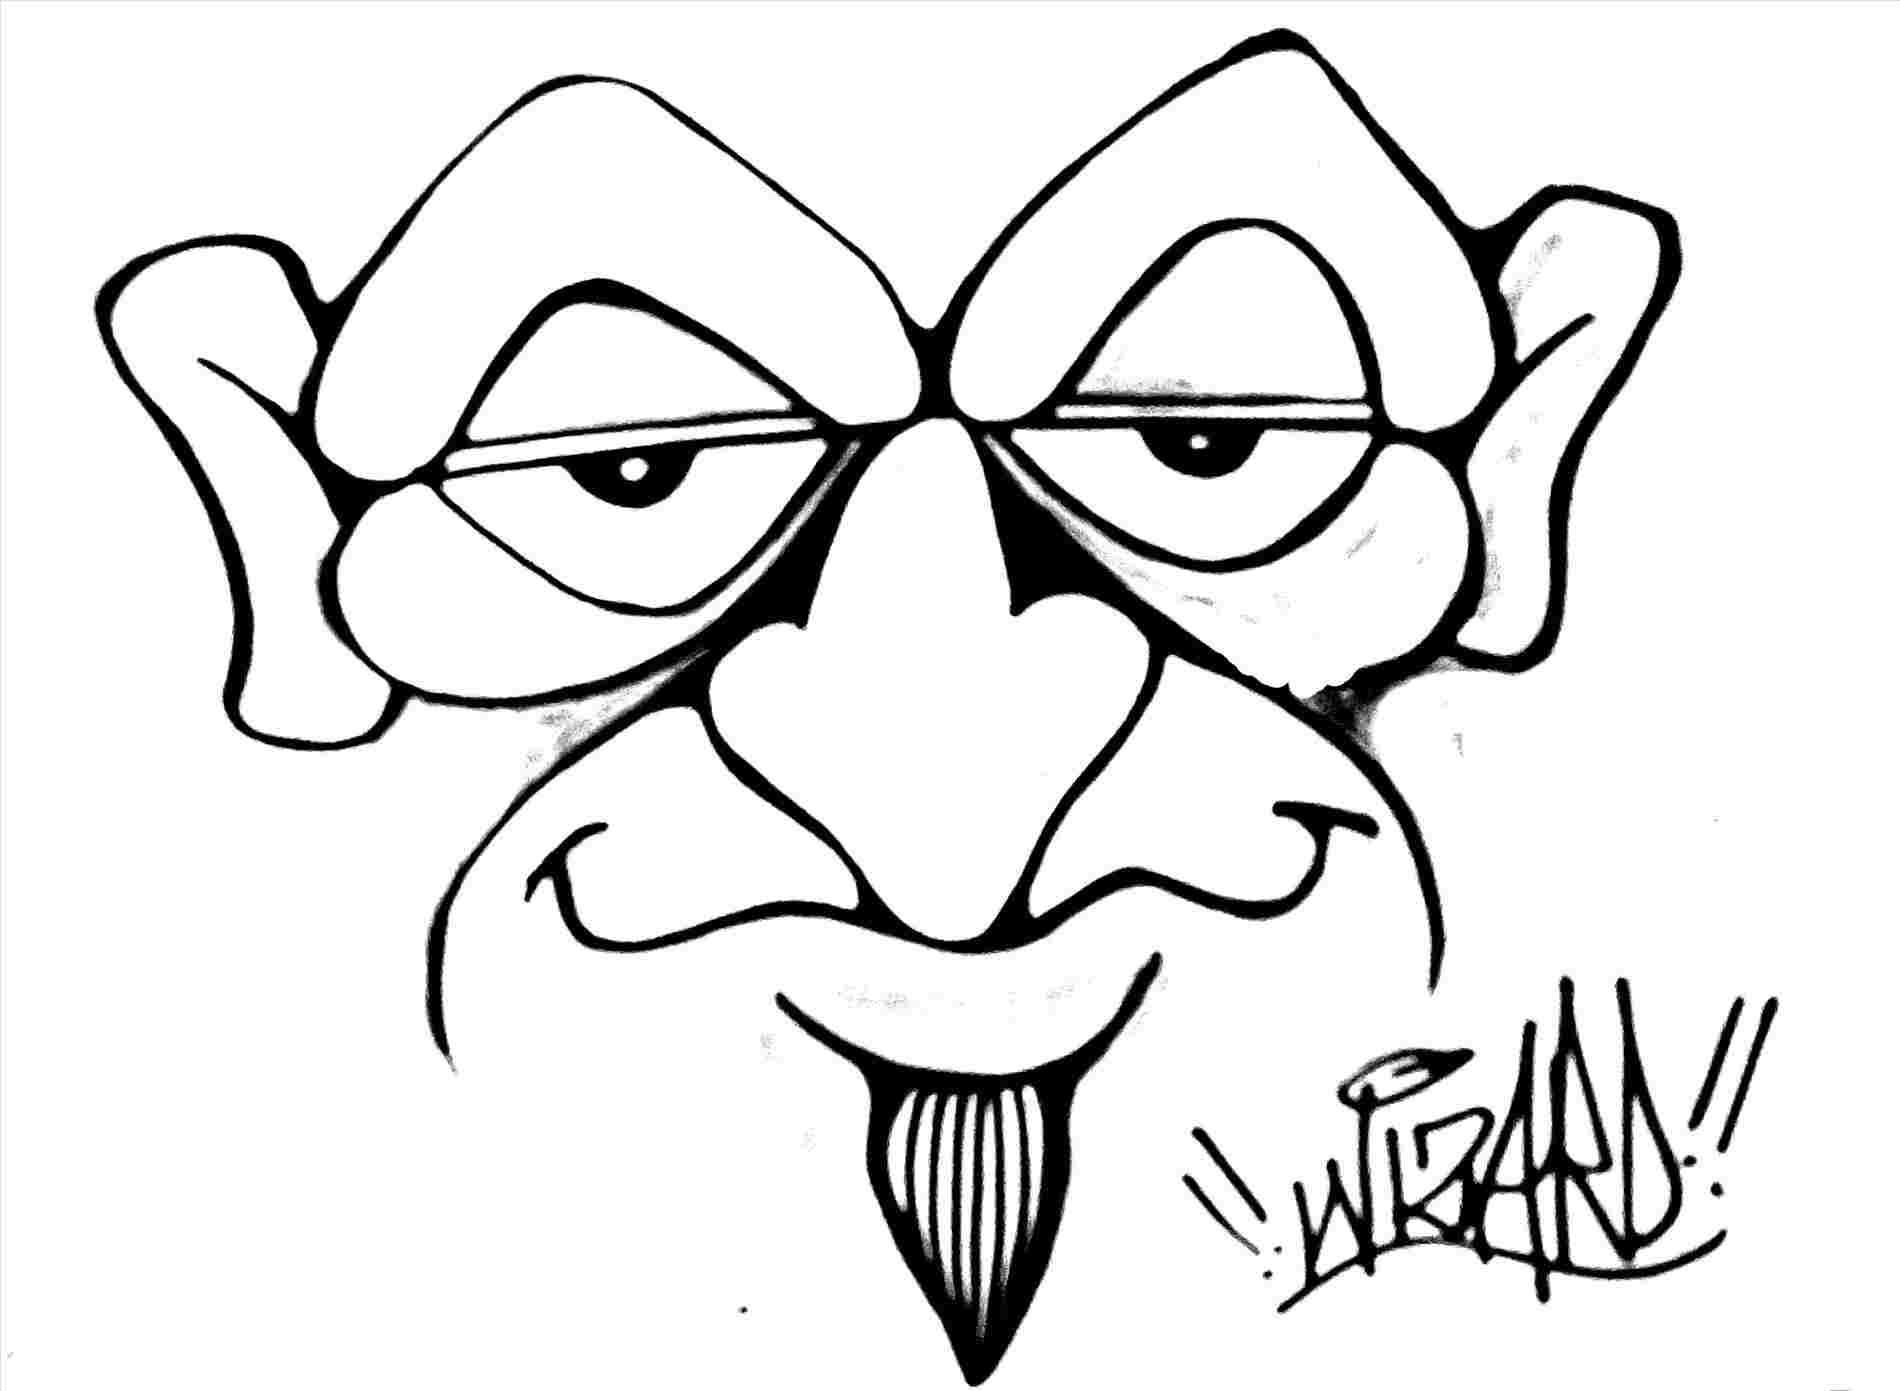 vector library stock Graffiti drawings for beginners. All drawing beginner.